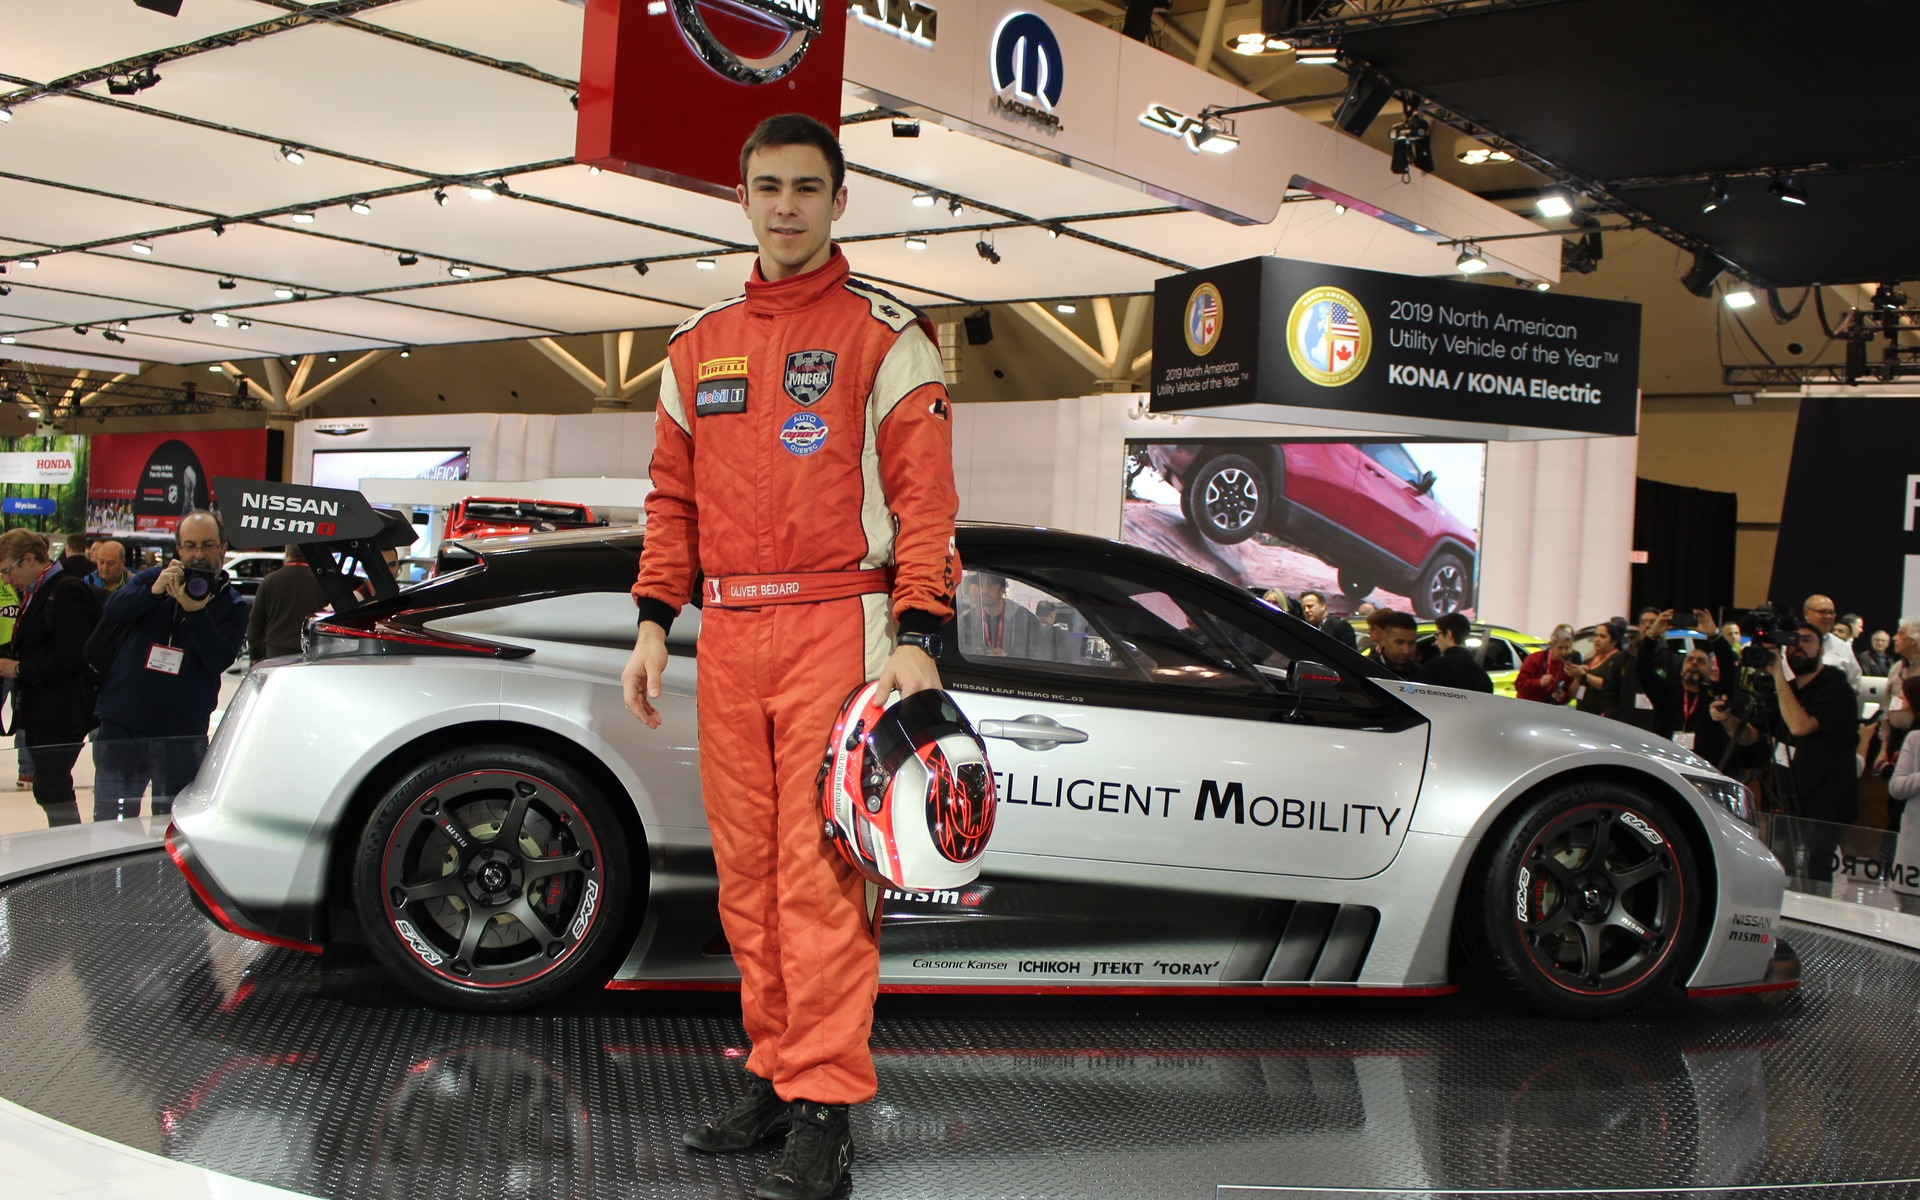 <p>Nissan LEAF Nismo RC and Olivier B&eacute;dard</p>